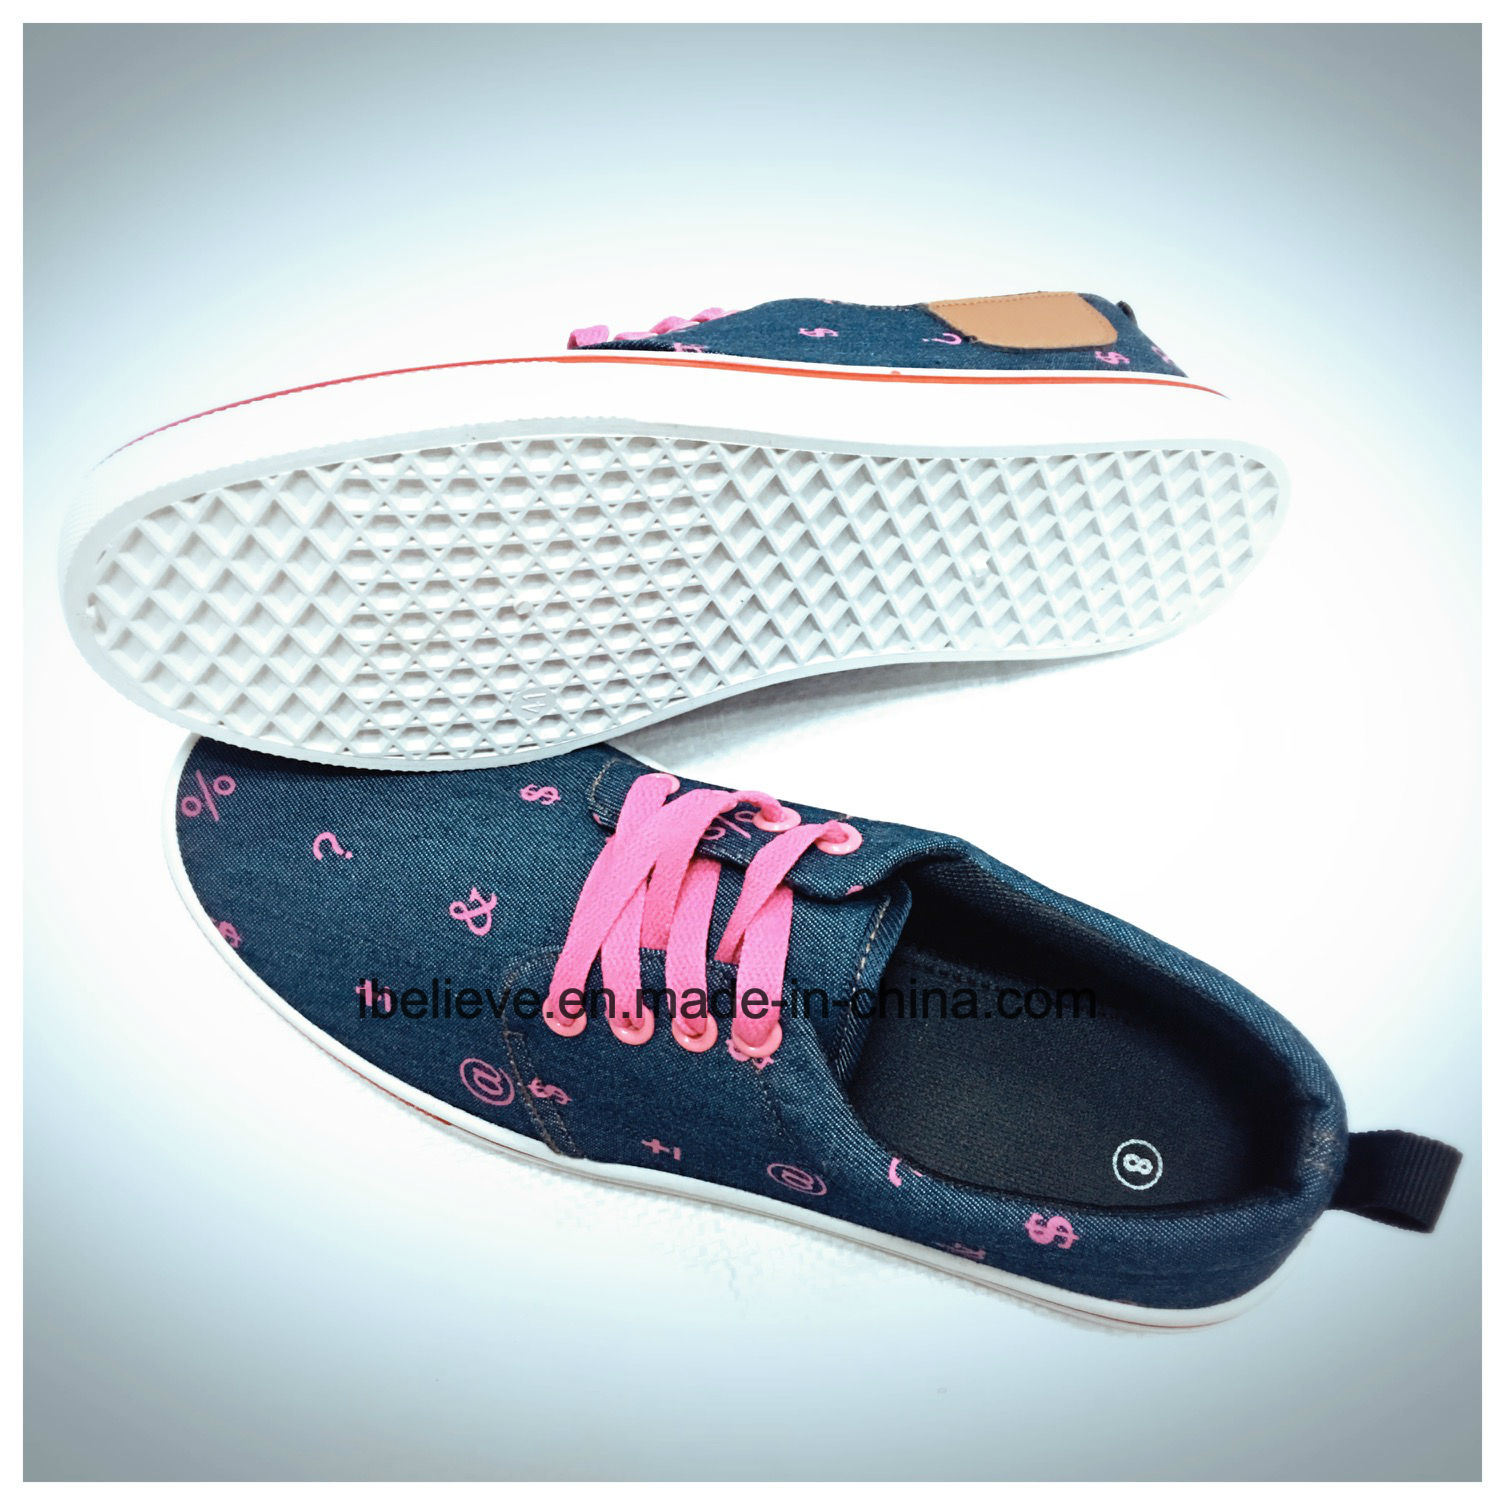 Comfort Shoes to Export